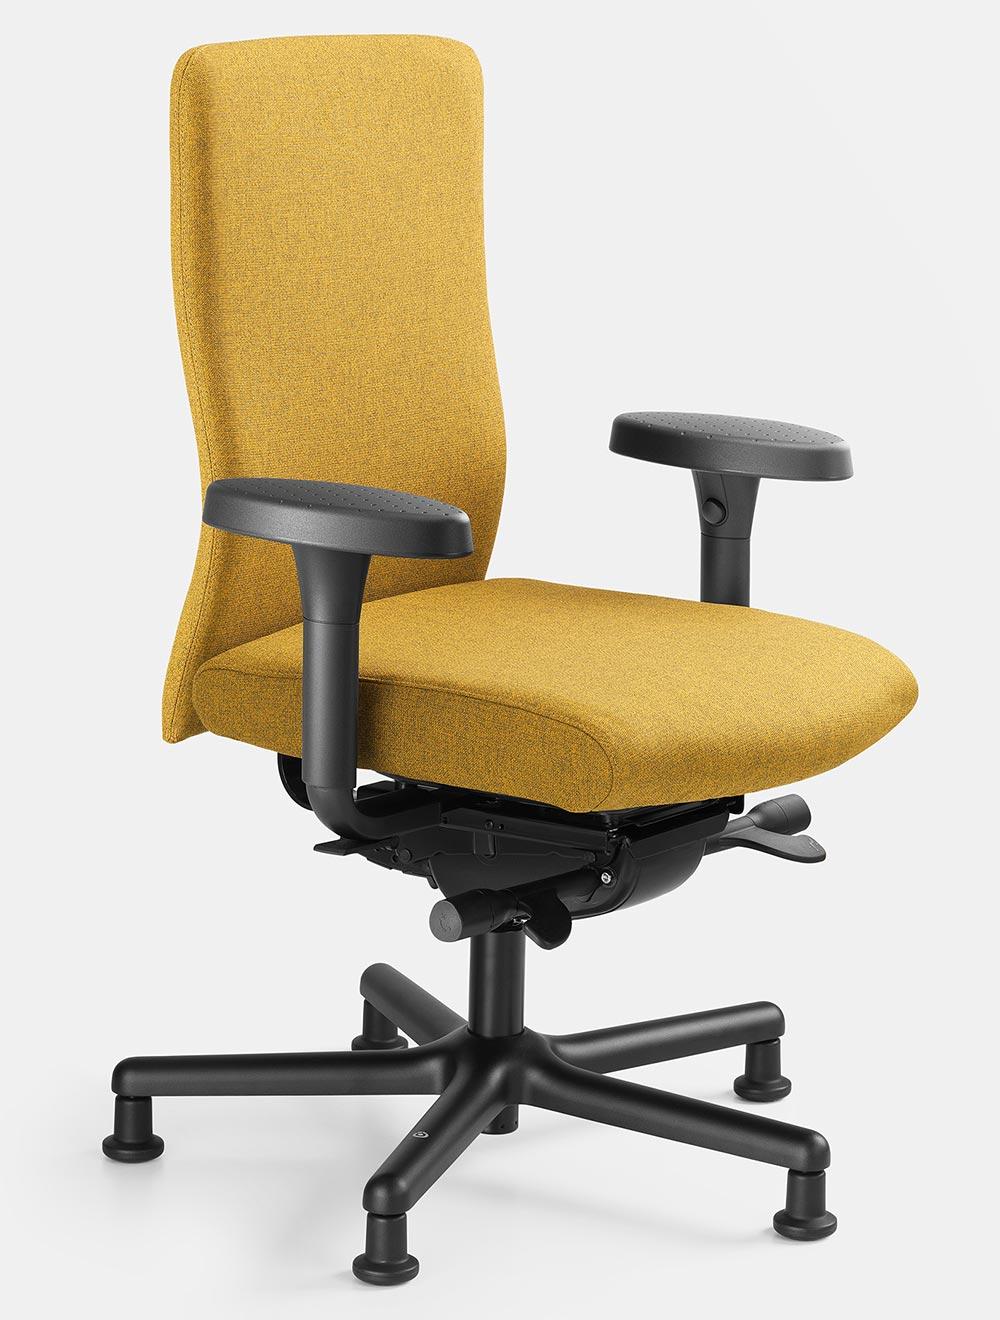 orthop dische ergonomische b rost hle aus berlin orthop dische ergonomische b rost hle aus. Black Bedroom Furniture Sets. Home Design Ideas